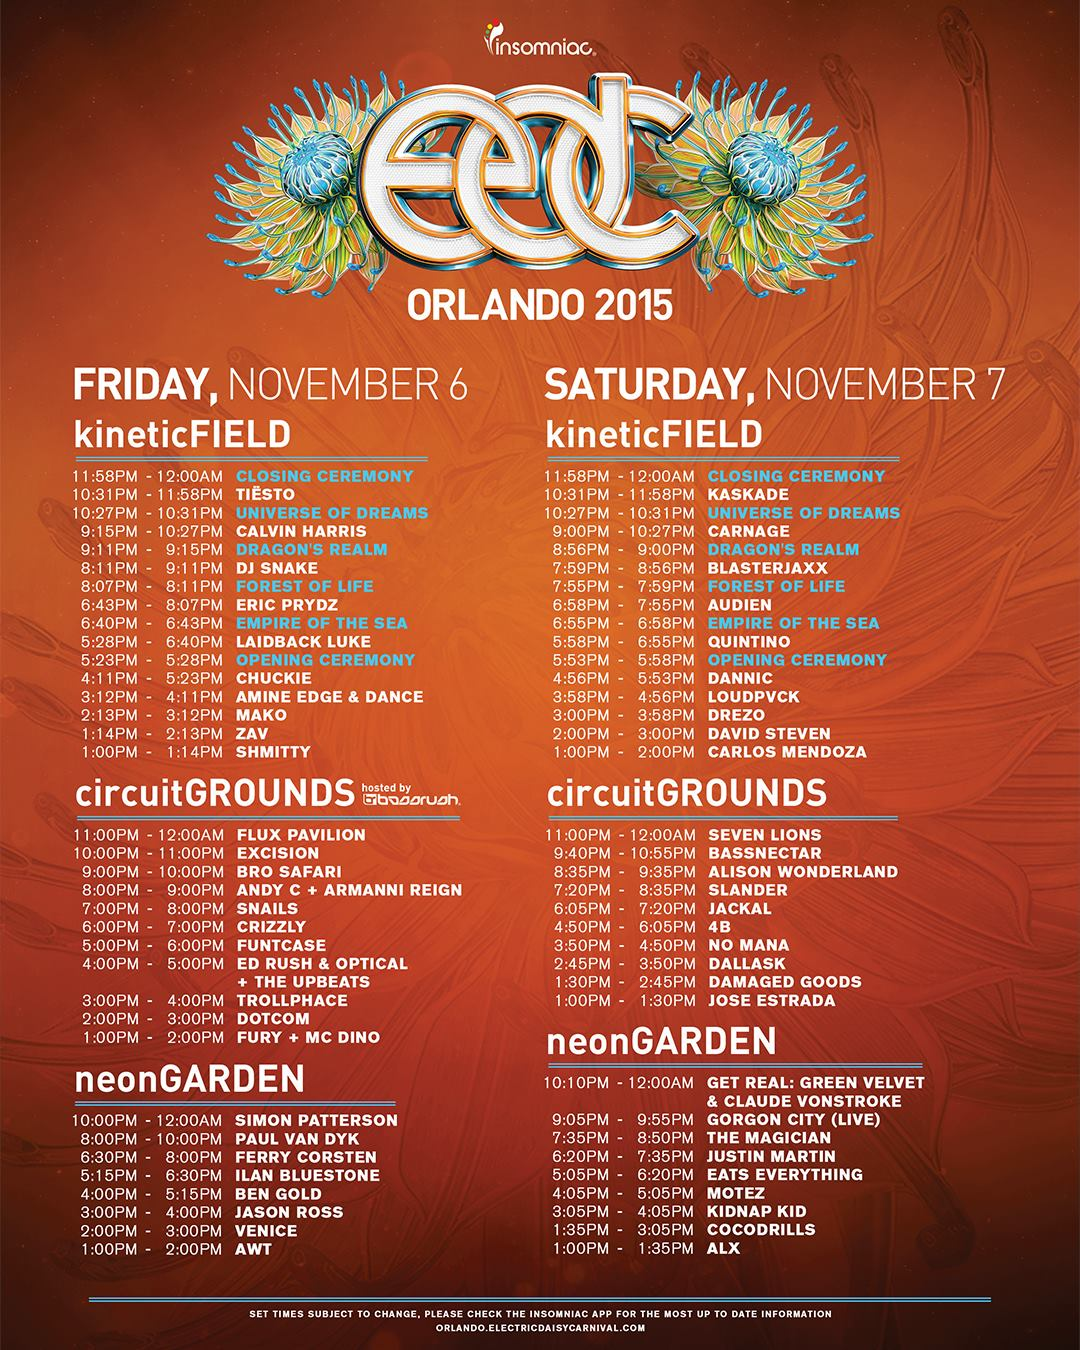 EDC Orlando Releases Set Times - Noiseporn